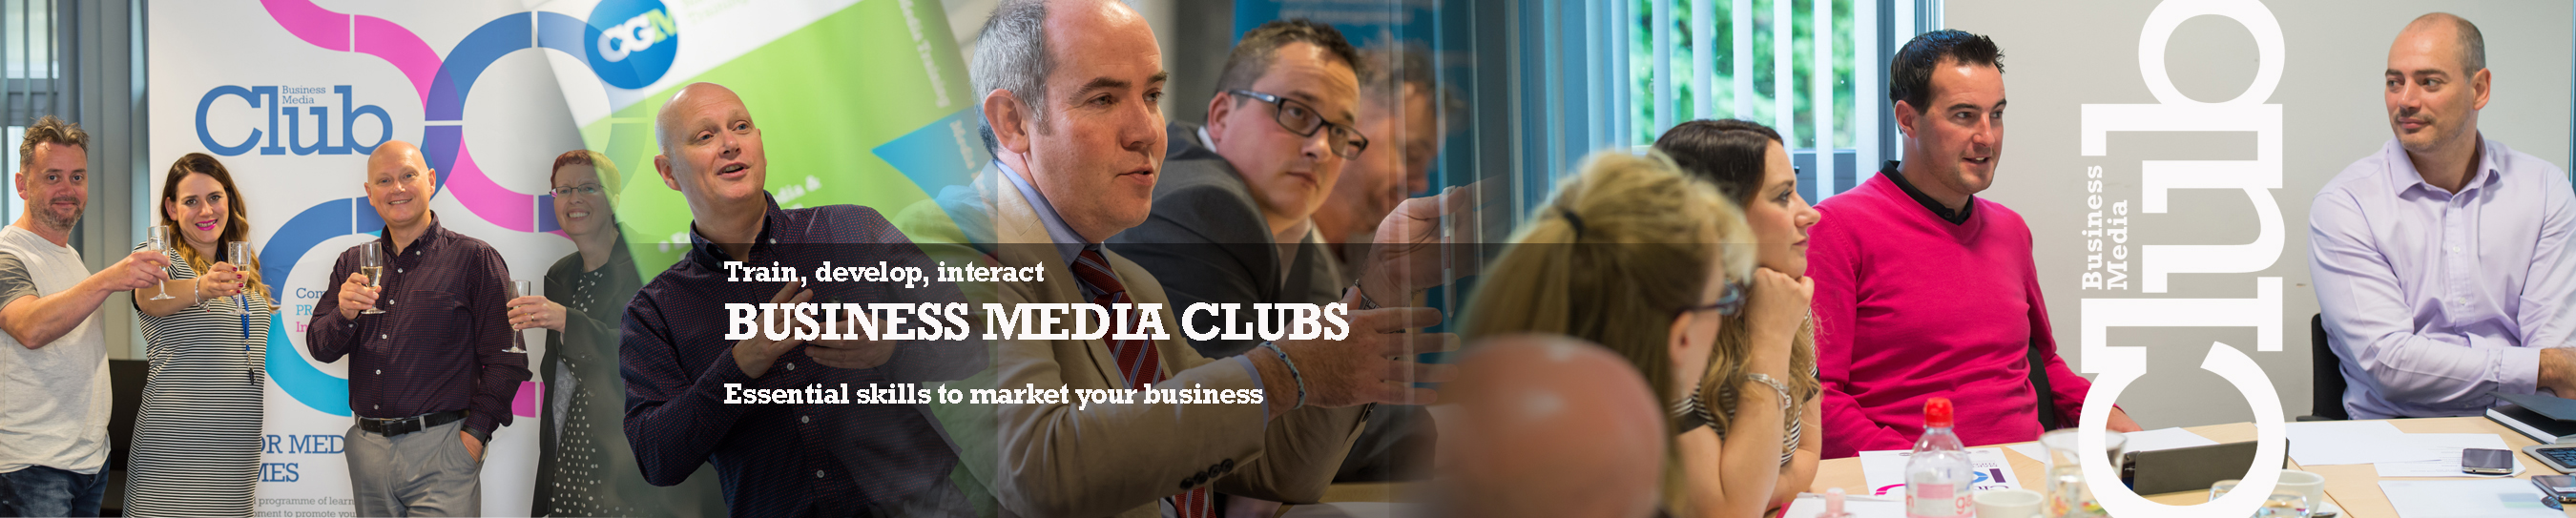 cgm-Media-clubs